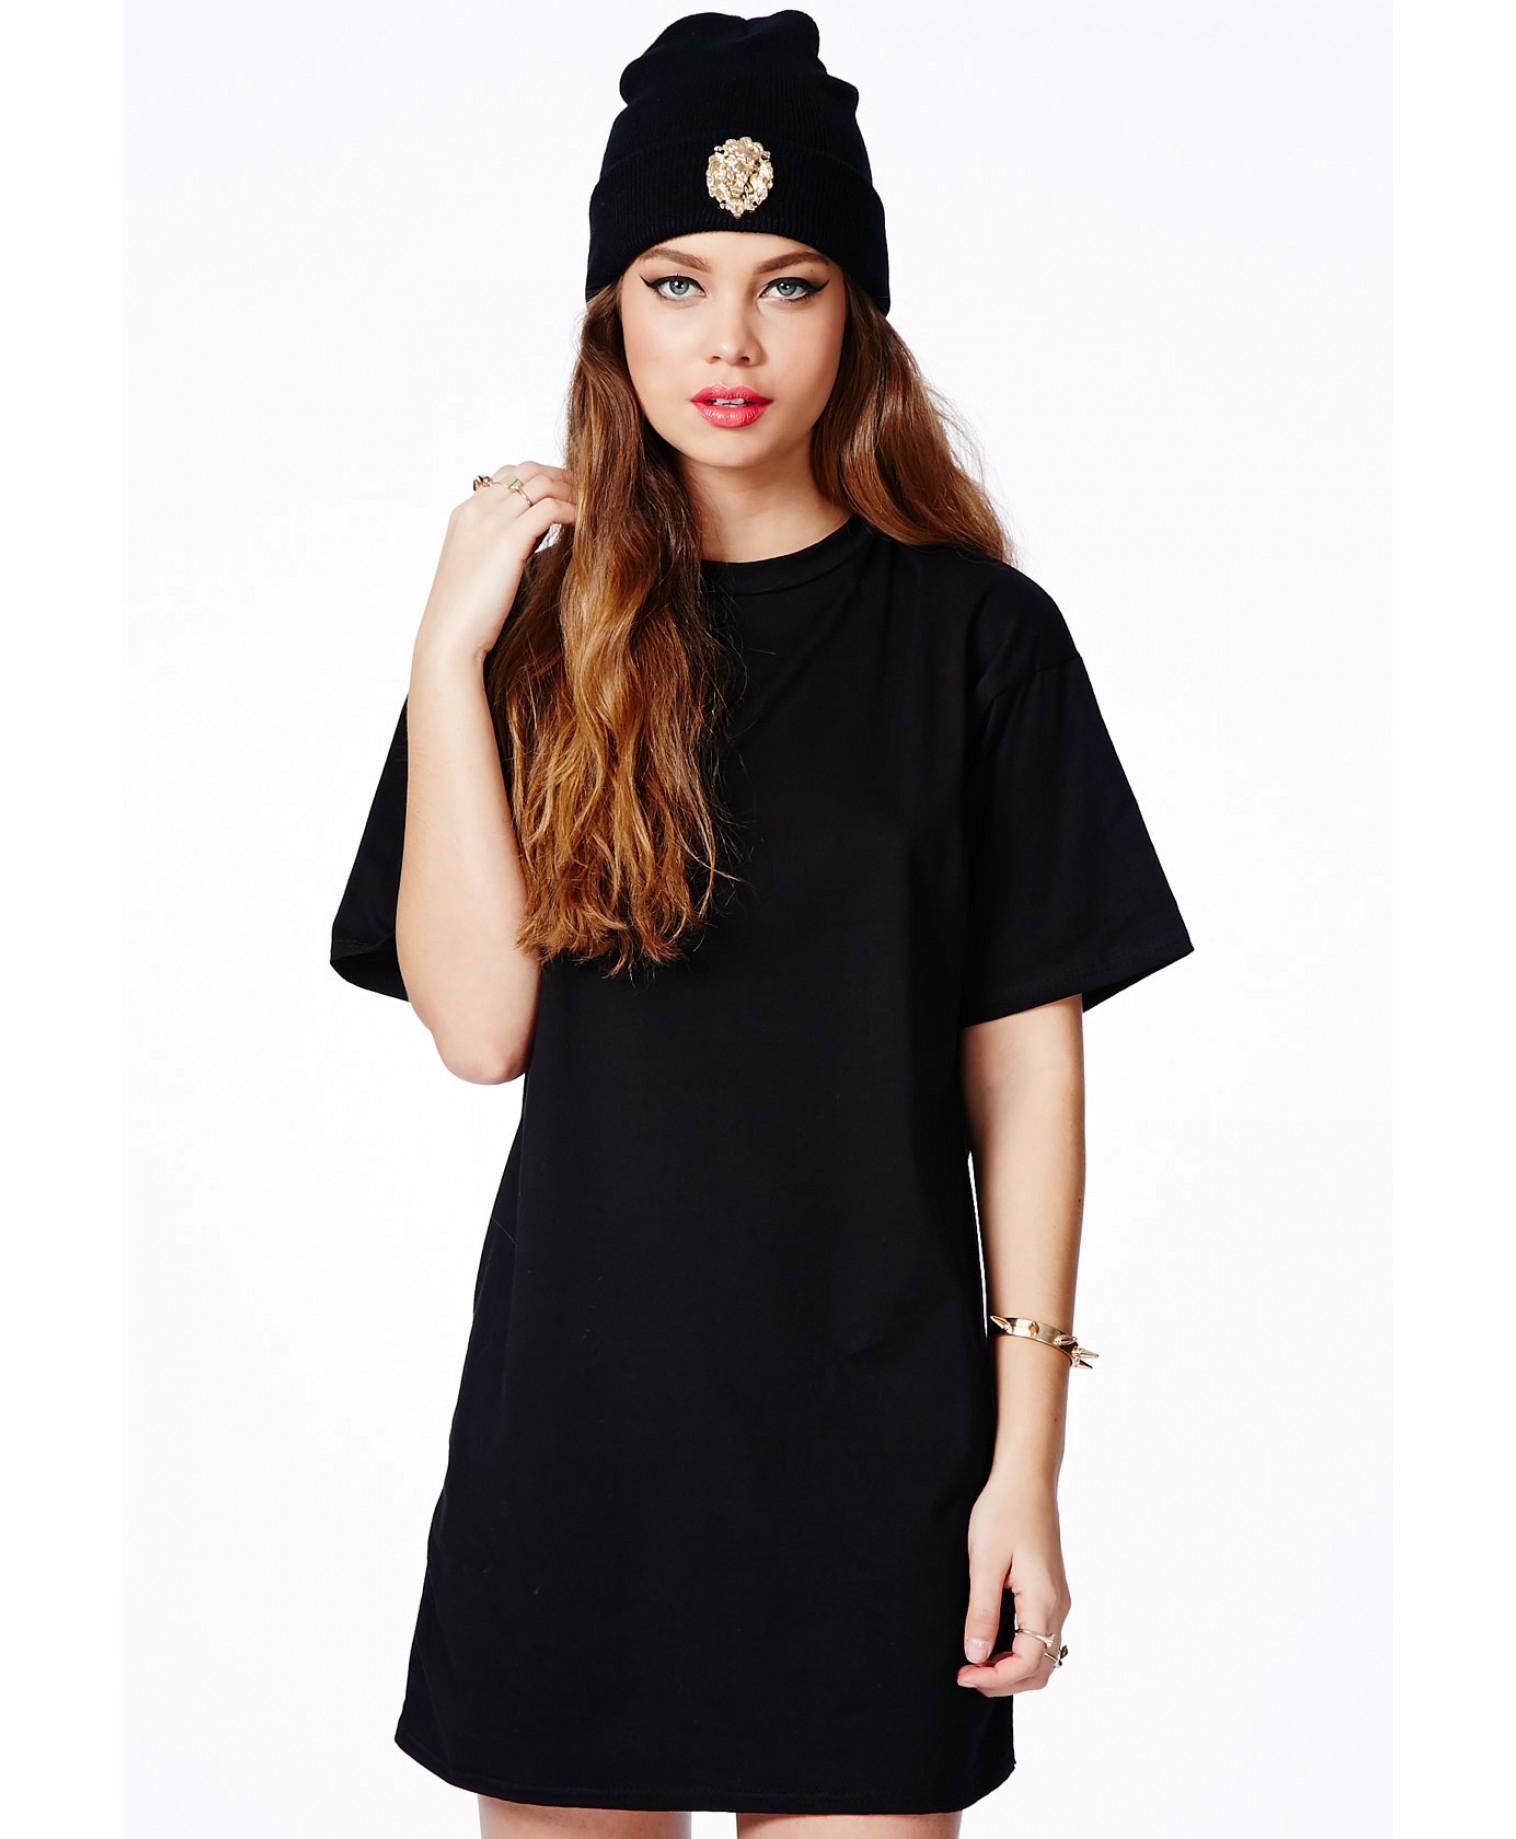 Oversized black t shirt - Gallery Women S T Shirt Dresses